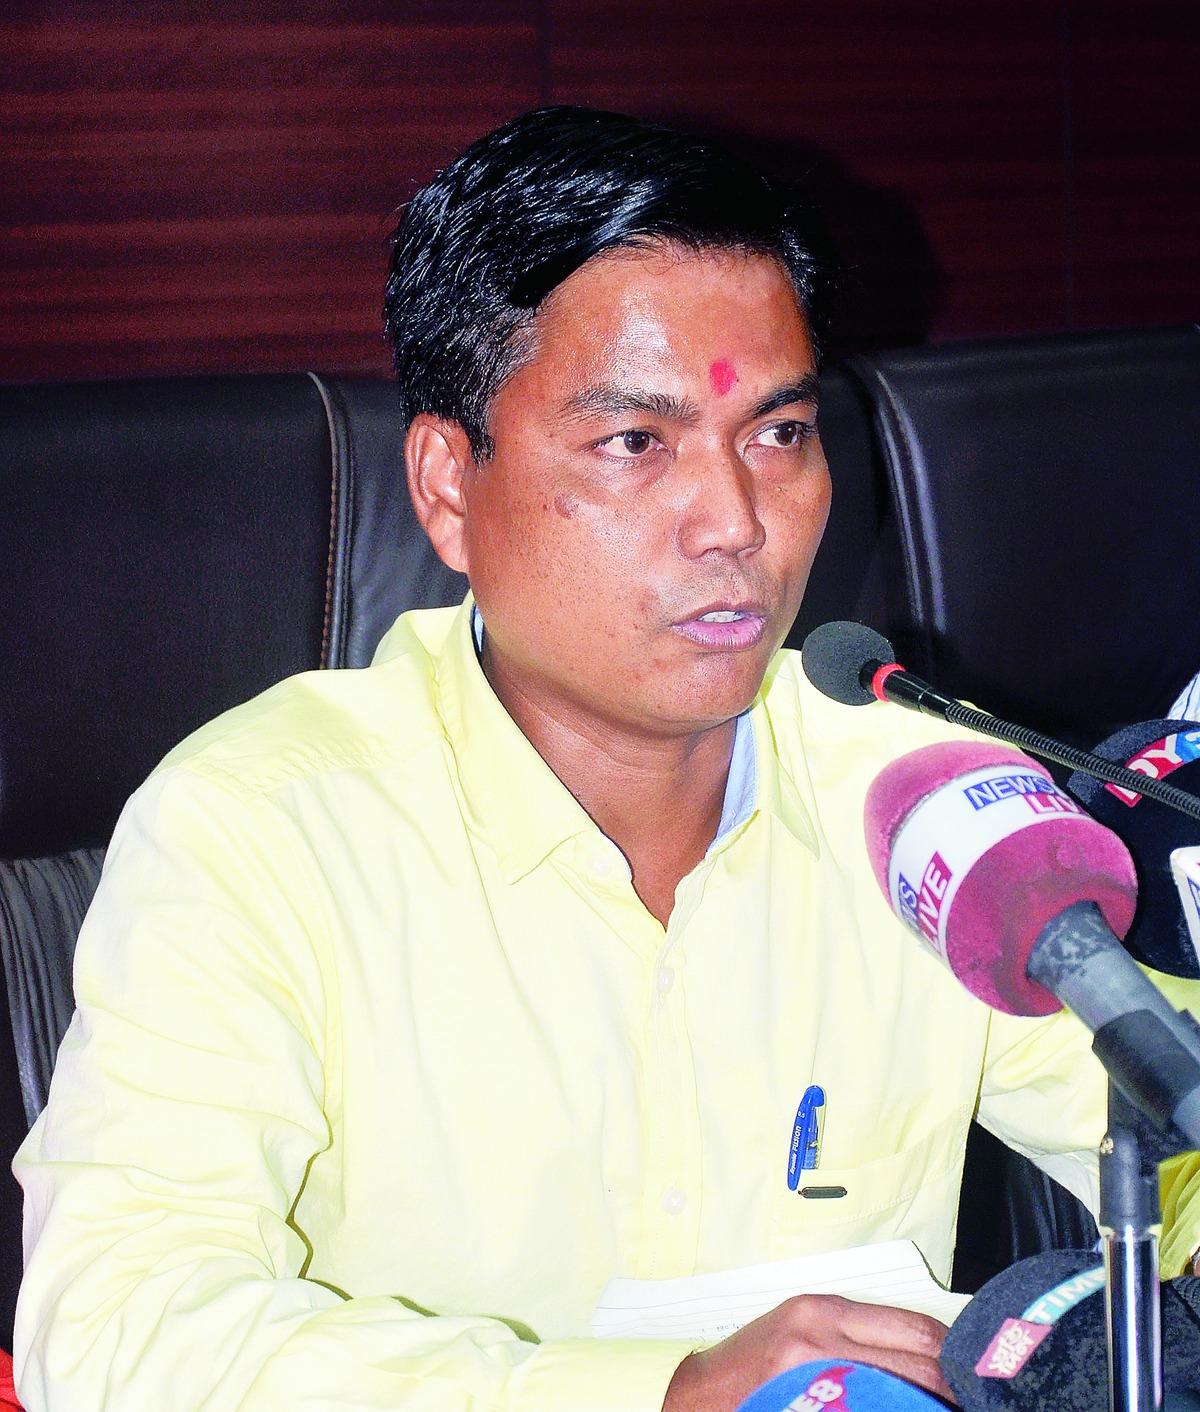 Mayor For Gmc Act Amendment Telegraph India